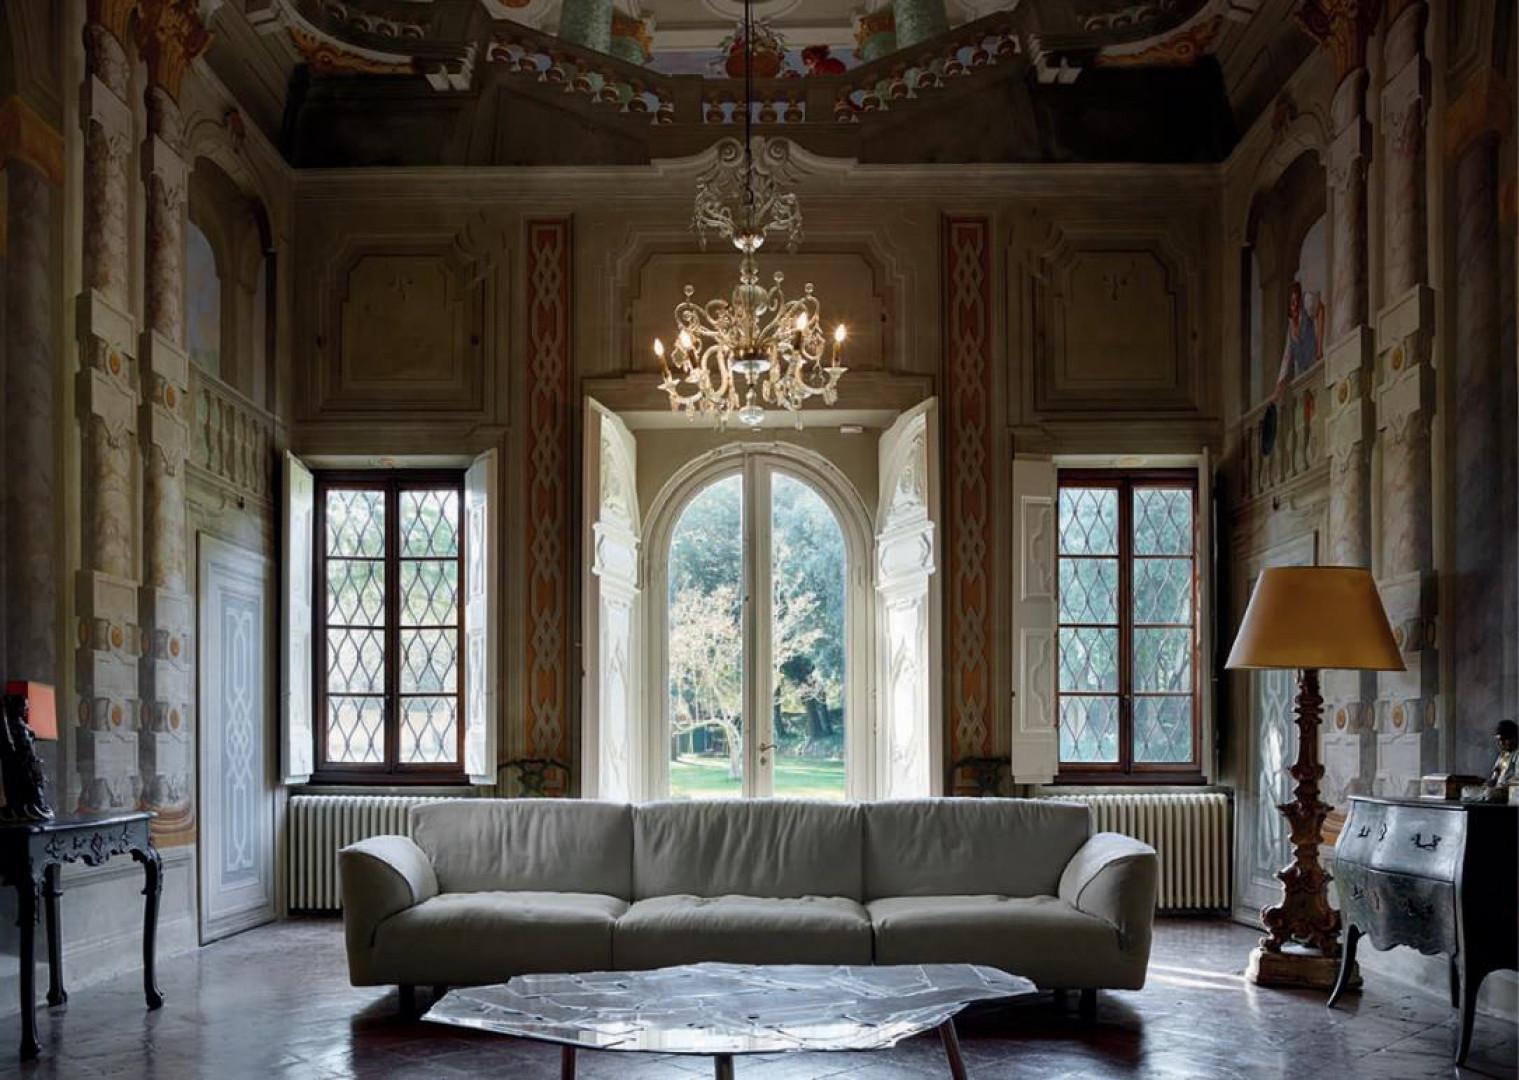 Sofa Grande Soffice marki Edra. Projekt: Francesco Binfarè. Fot. Edra